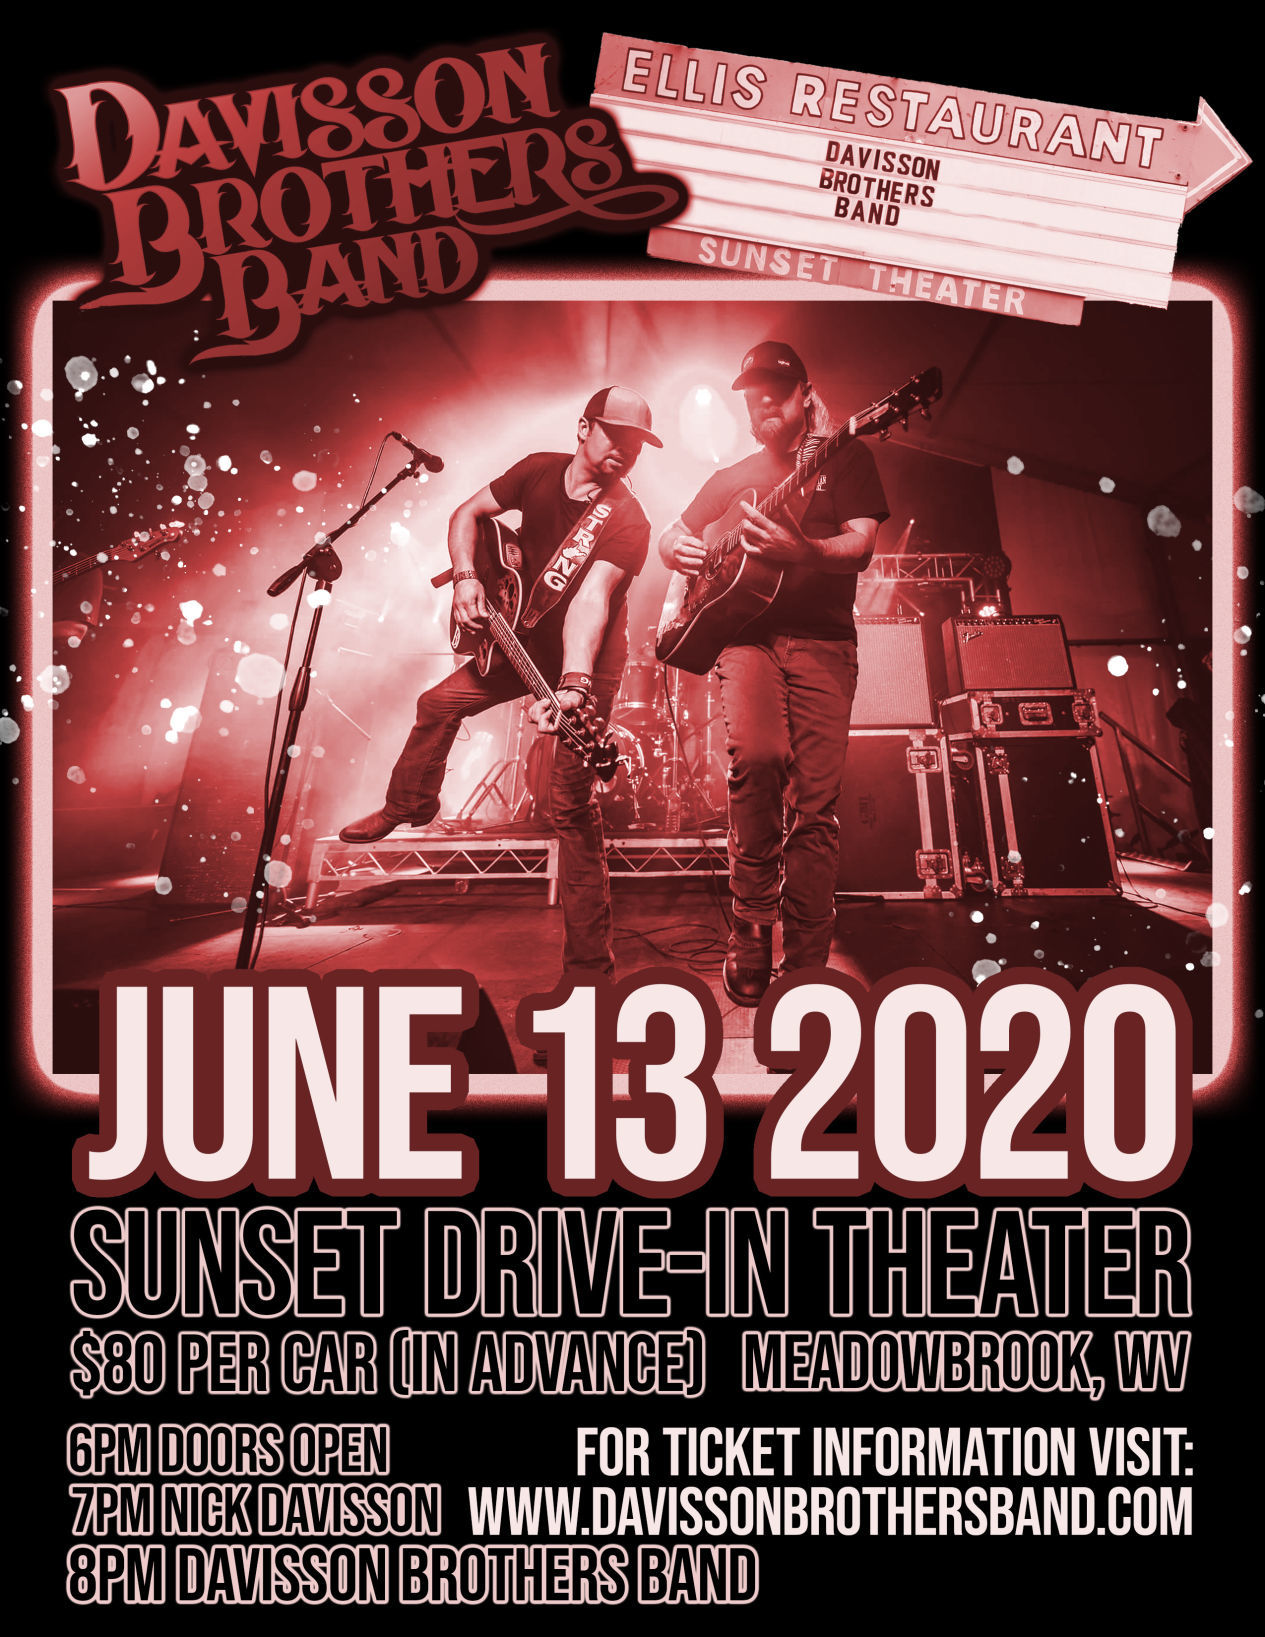 Davisson Brothers Band to perform